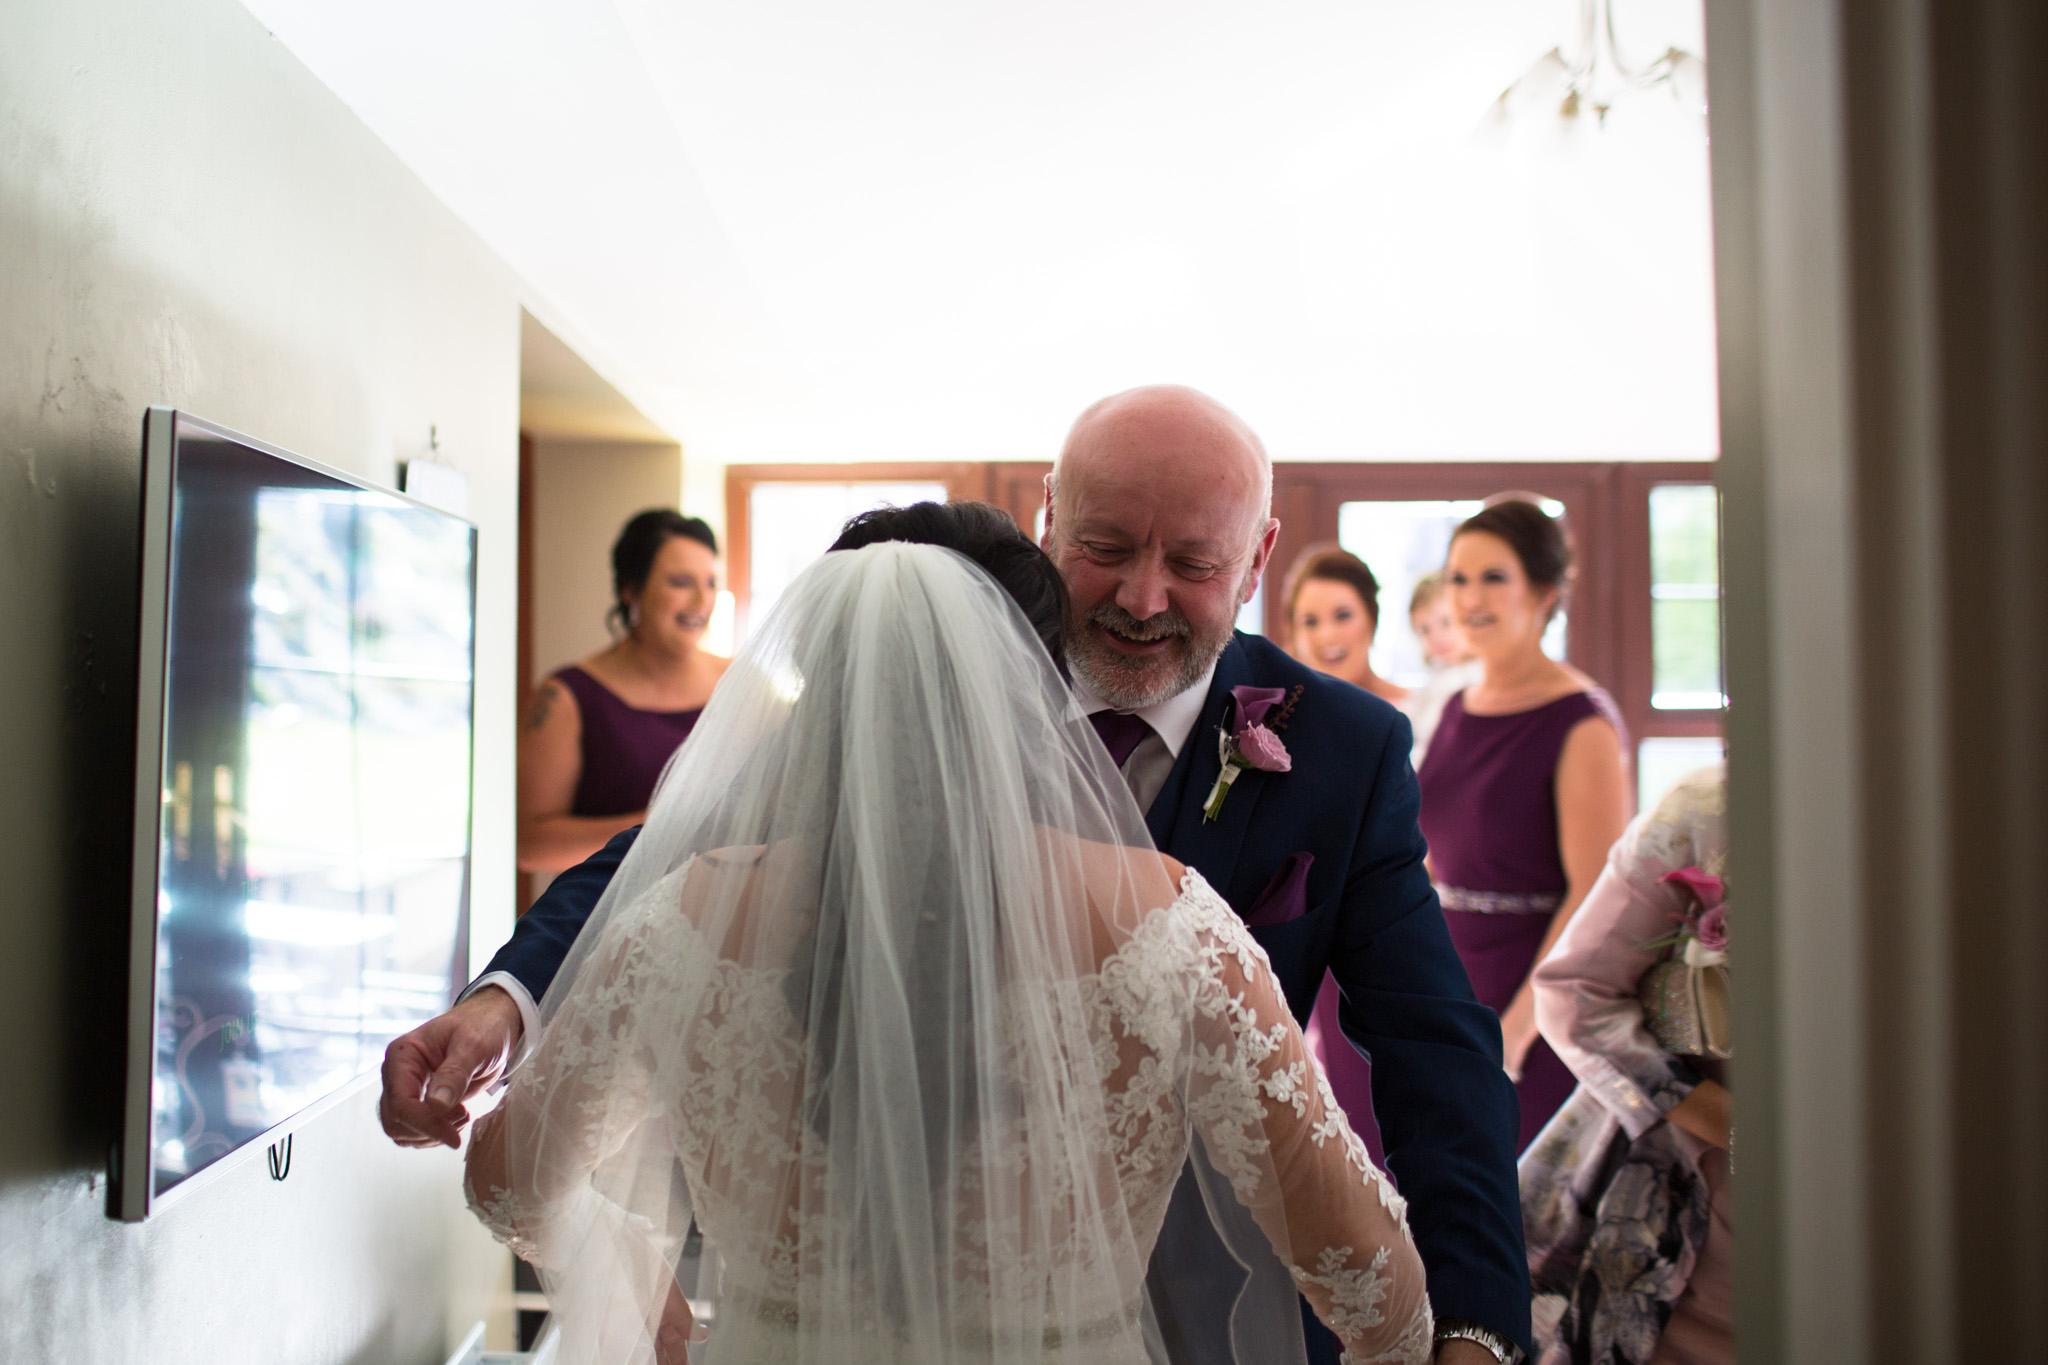 Mark_Barnes_Northern_Ireland_Wedding_Photography_Marine_hotel_ballycastle_Wedding_Photography_Janet&Darren-9.jpg